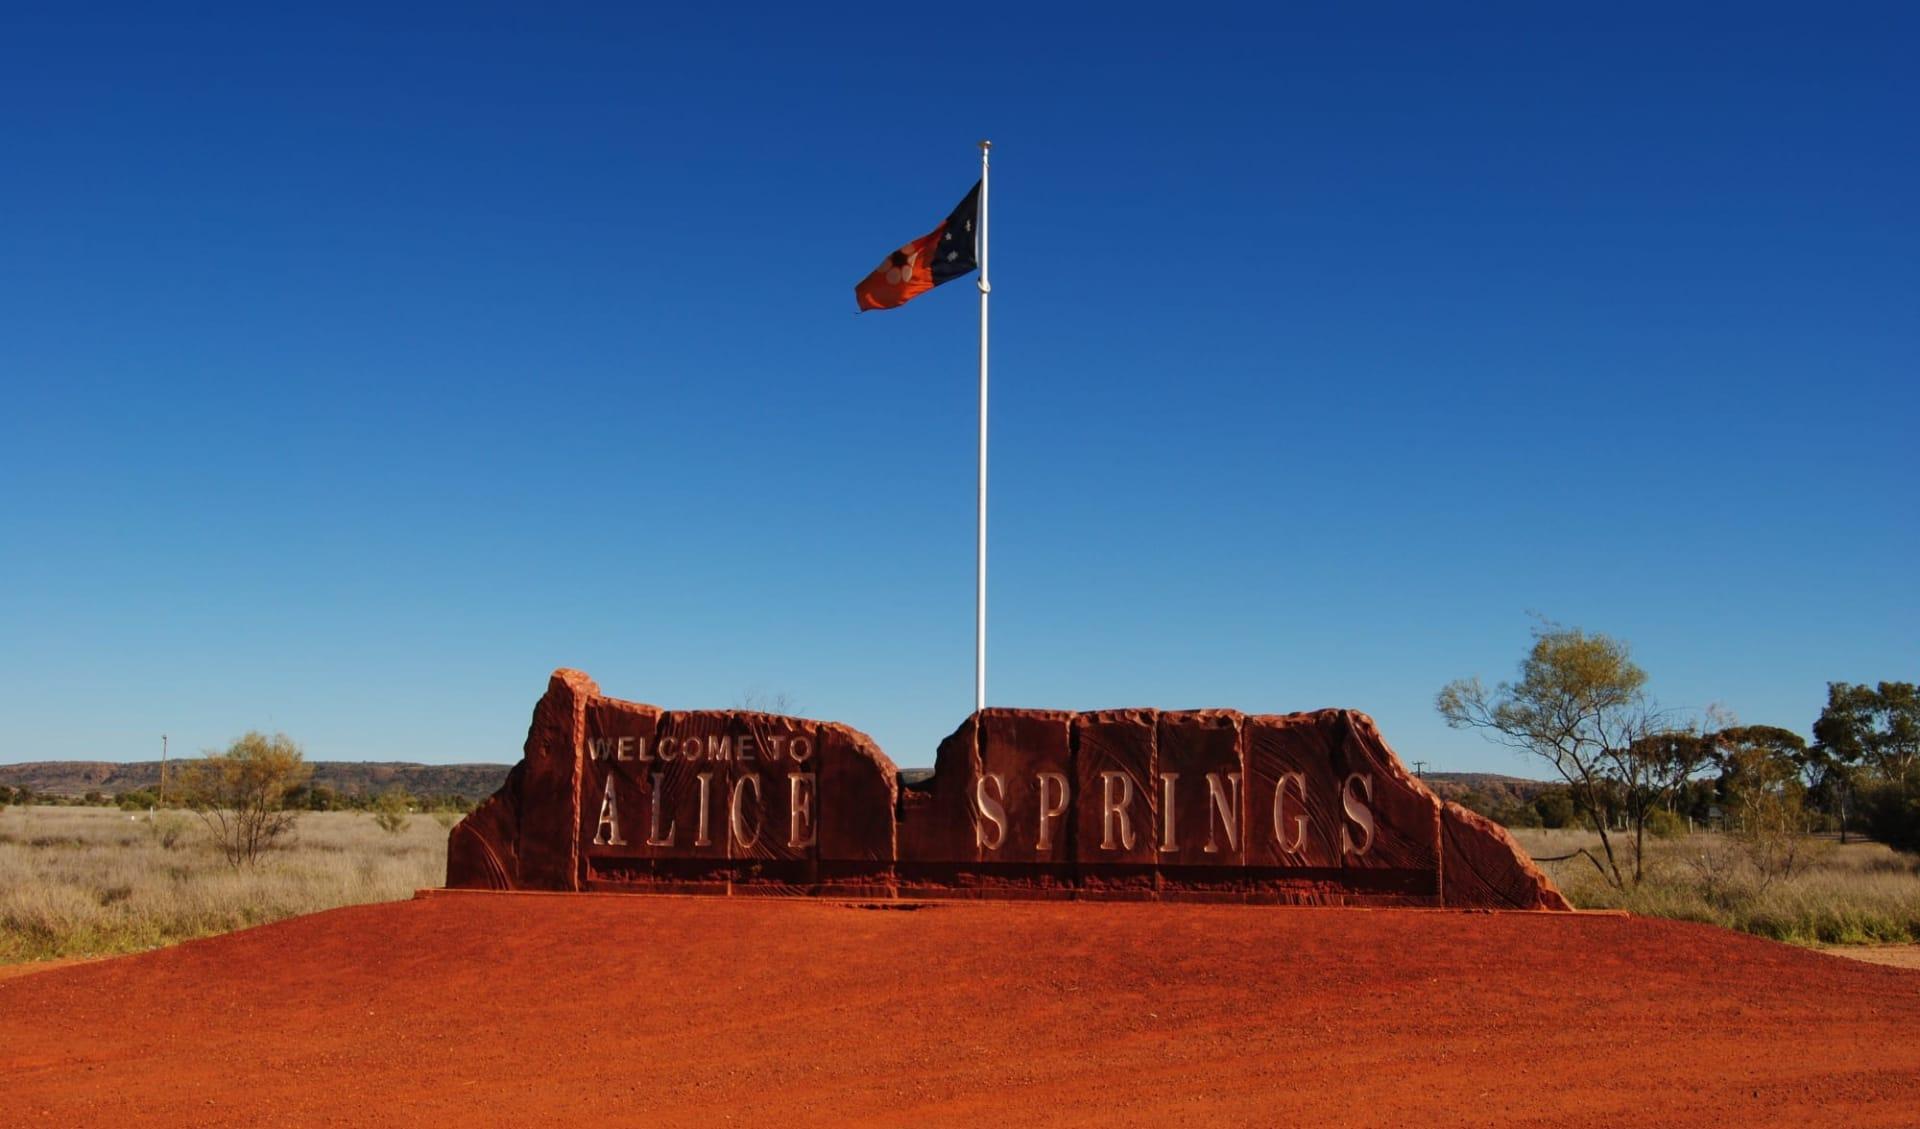 Aurora Alice Springs:  Australien, Alice Springs